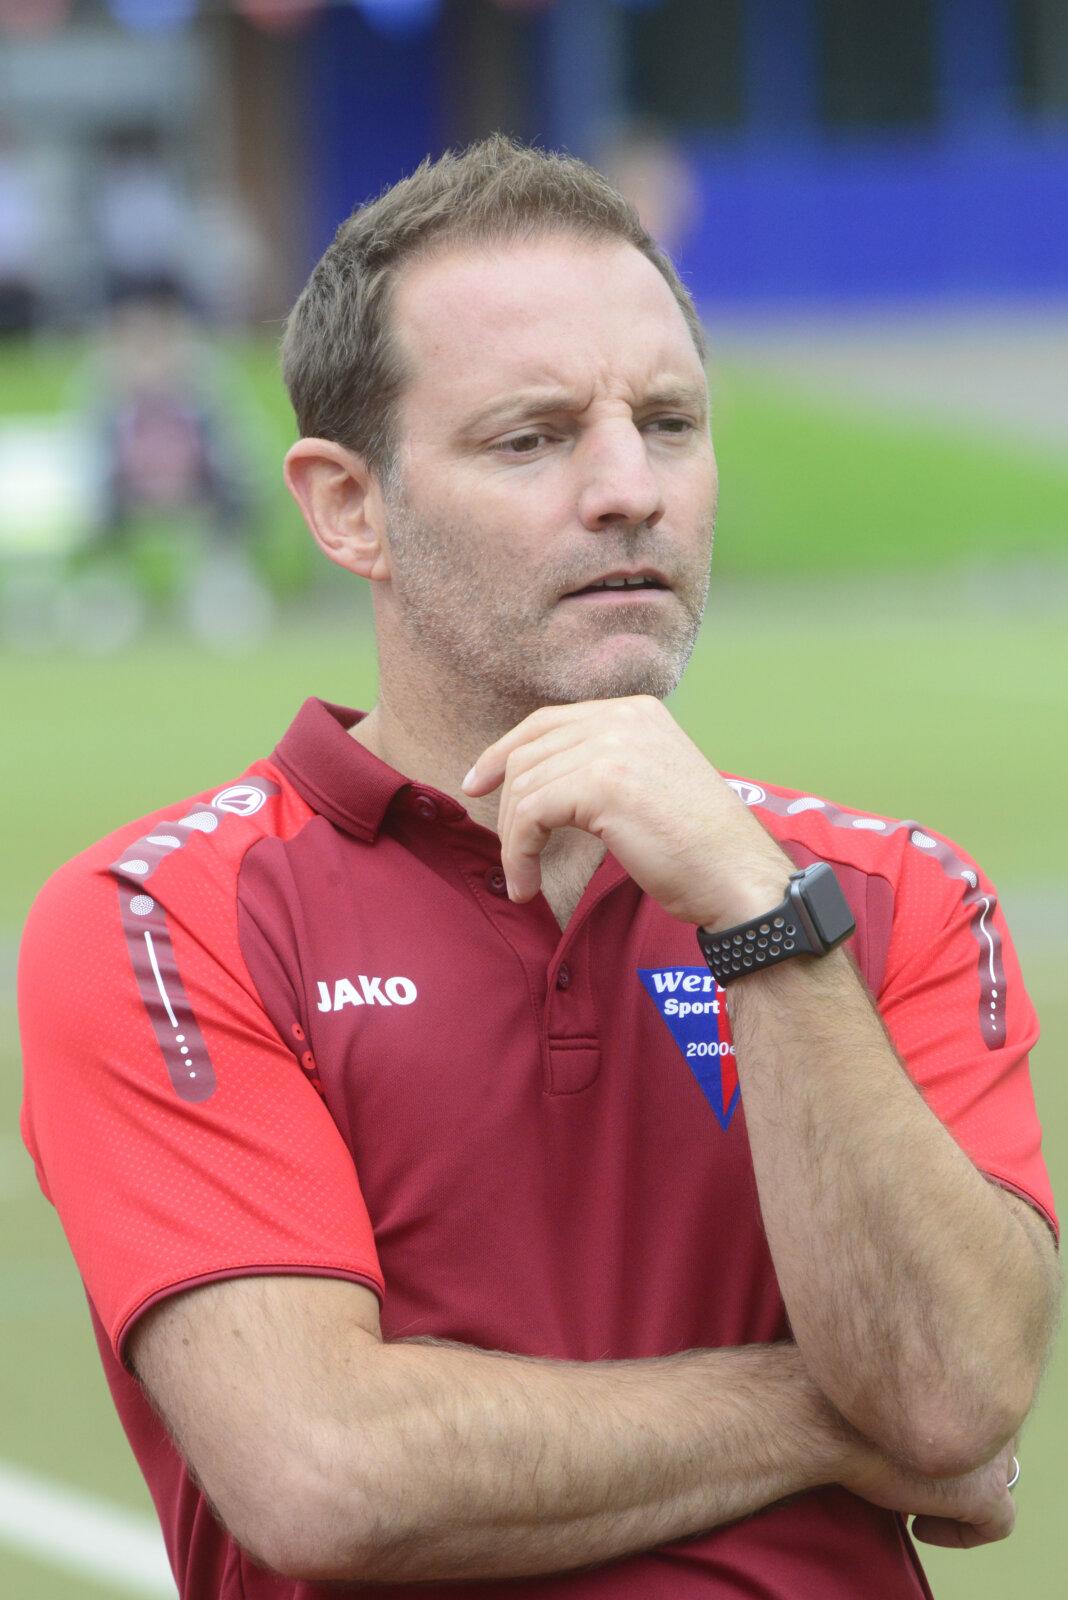 WSC-Trainer Lars Müller war zufrieden. Foto: Jörg Stengl